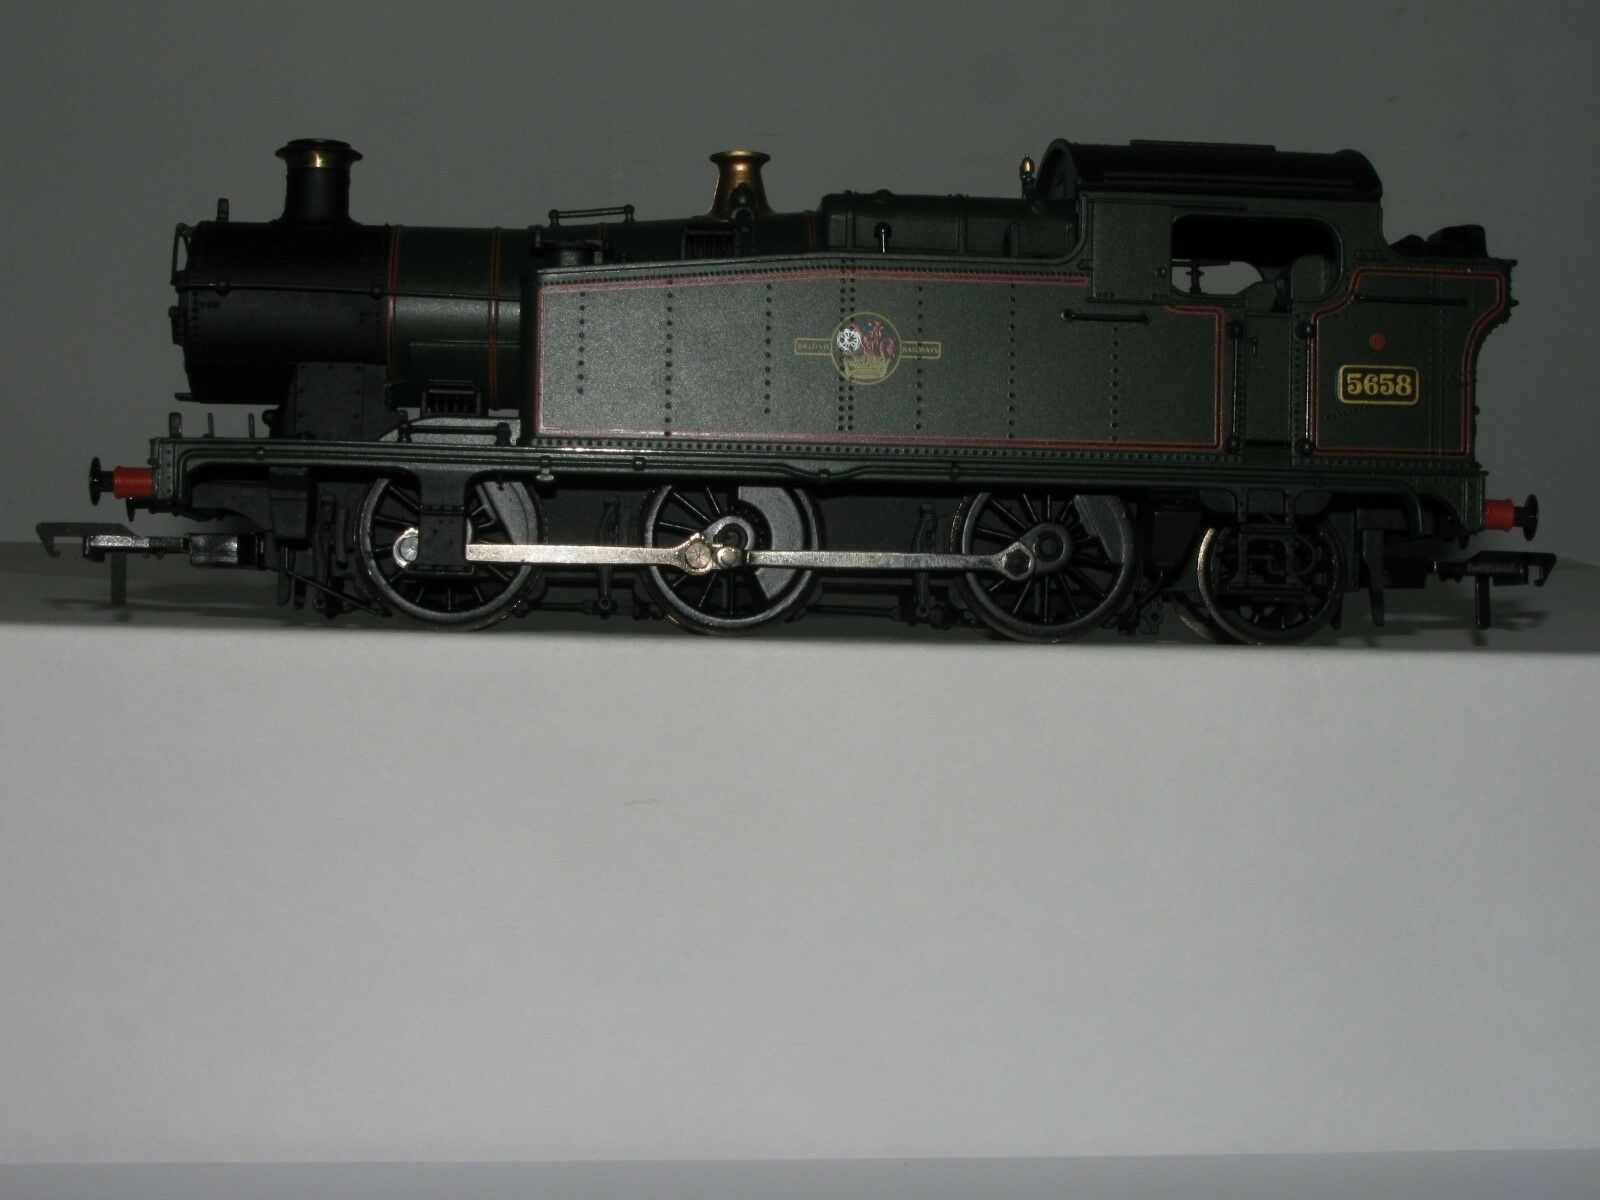 Branchline Bachuomon OO scala 32-077 classe 56XX Tank 558 BR Lined verde L Crest